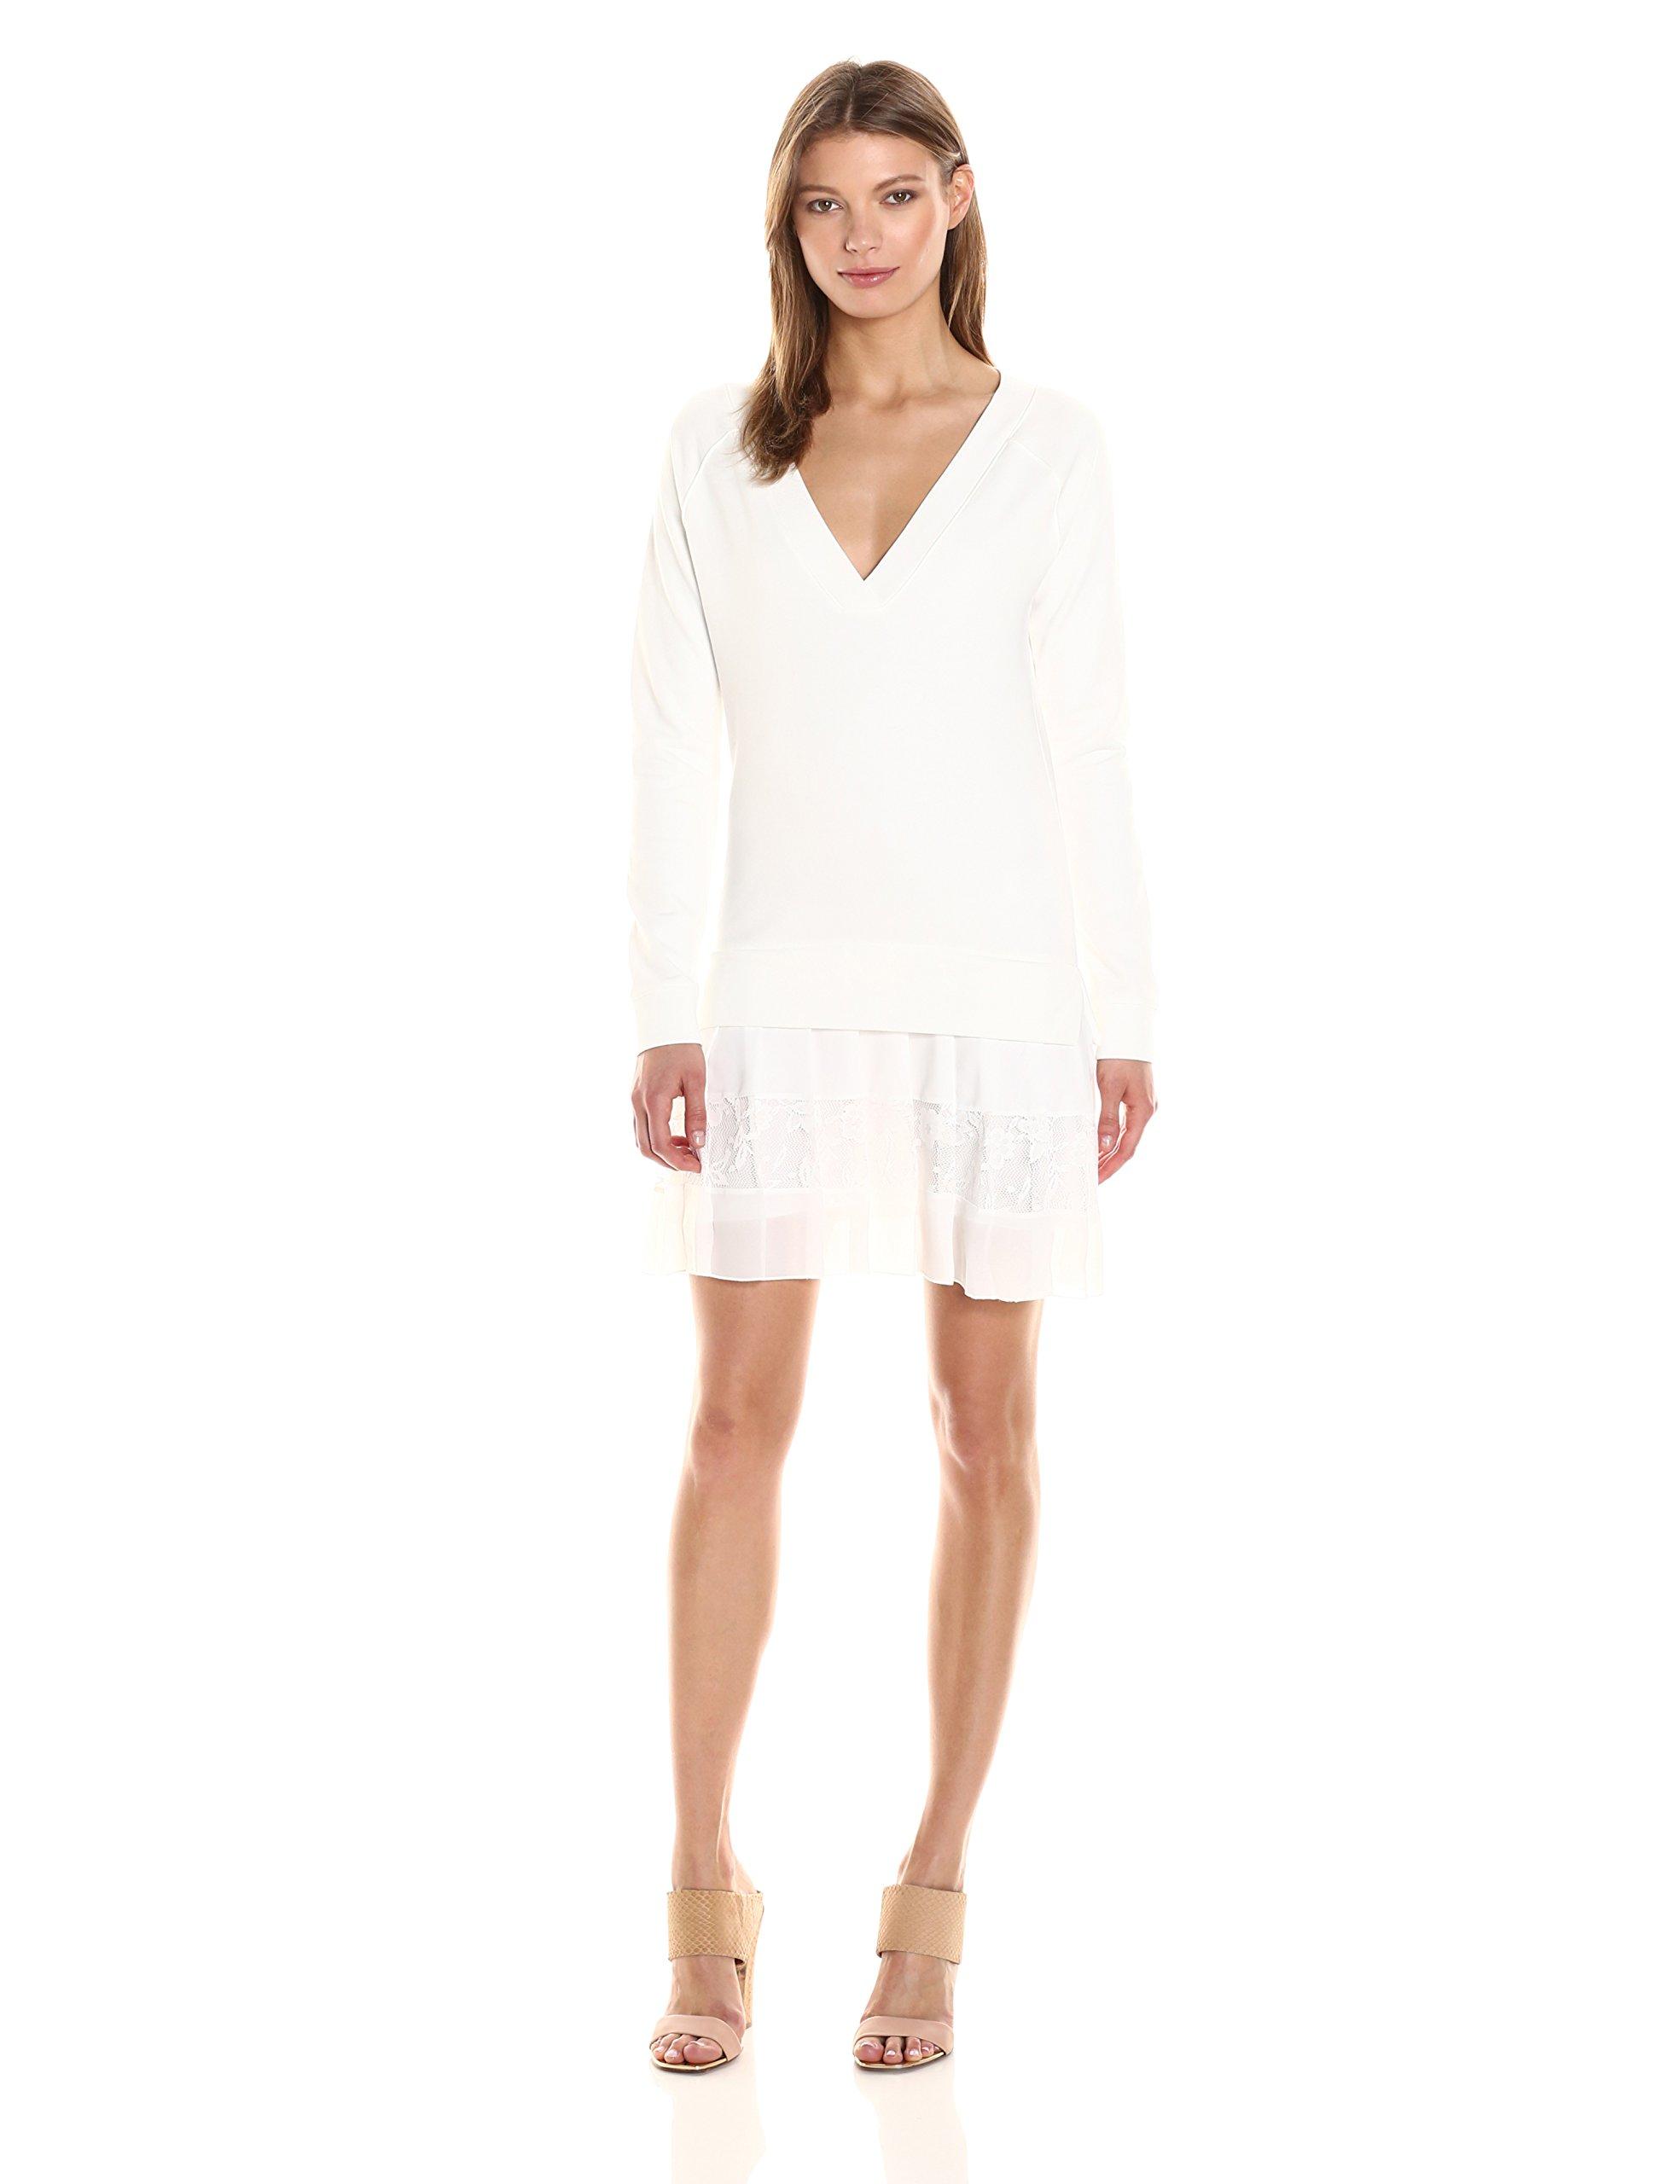 French Connection Women's Eliza Jersey Sweatshirt Dress, Summer White, 8